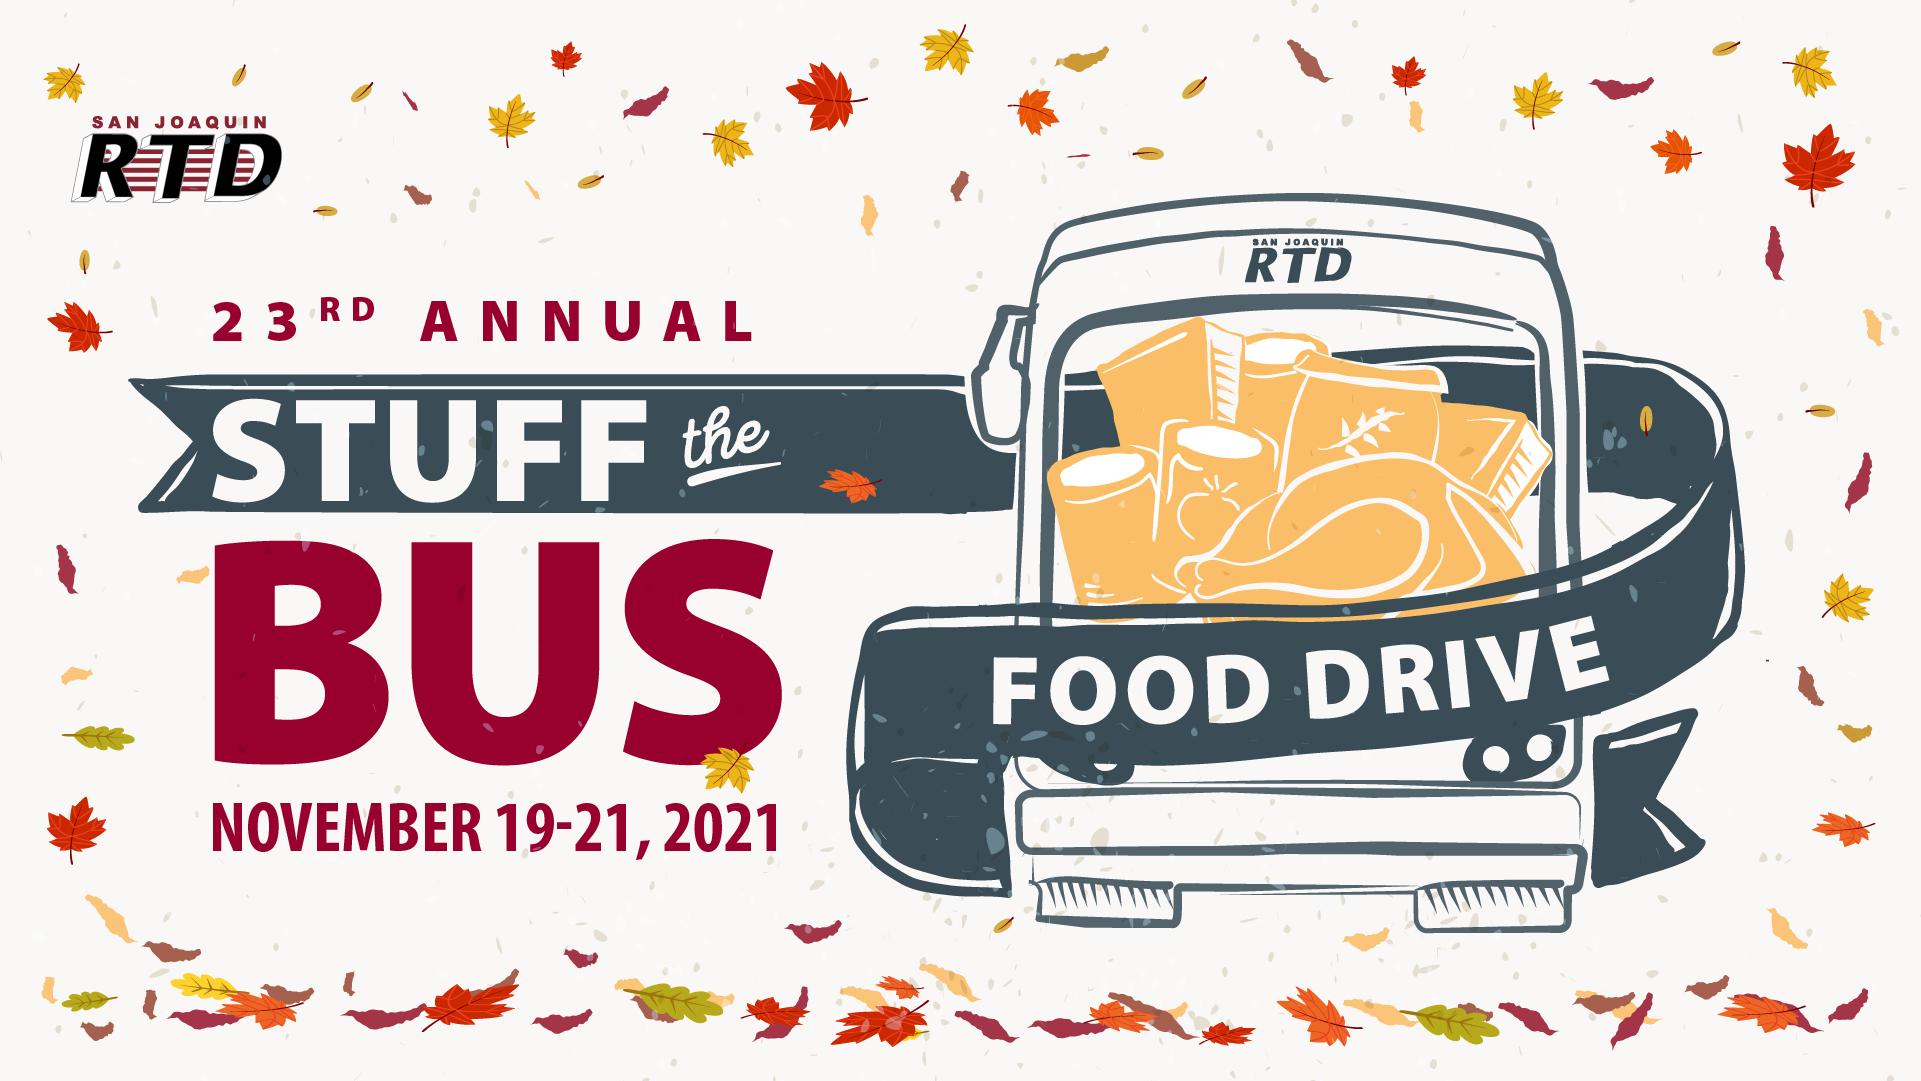 Stuff the Bus - Nov. 20-22, 2020